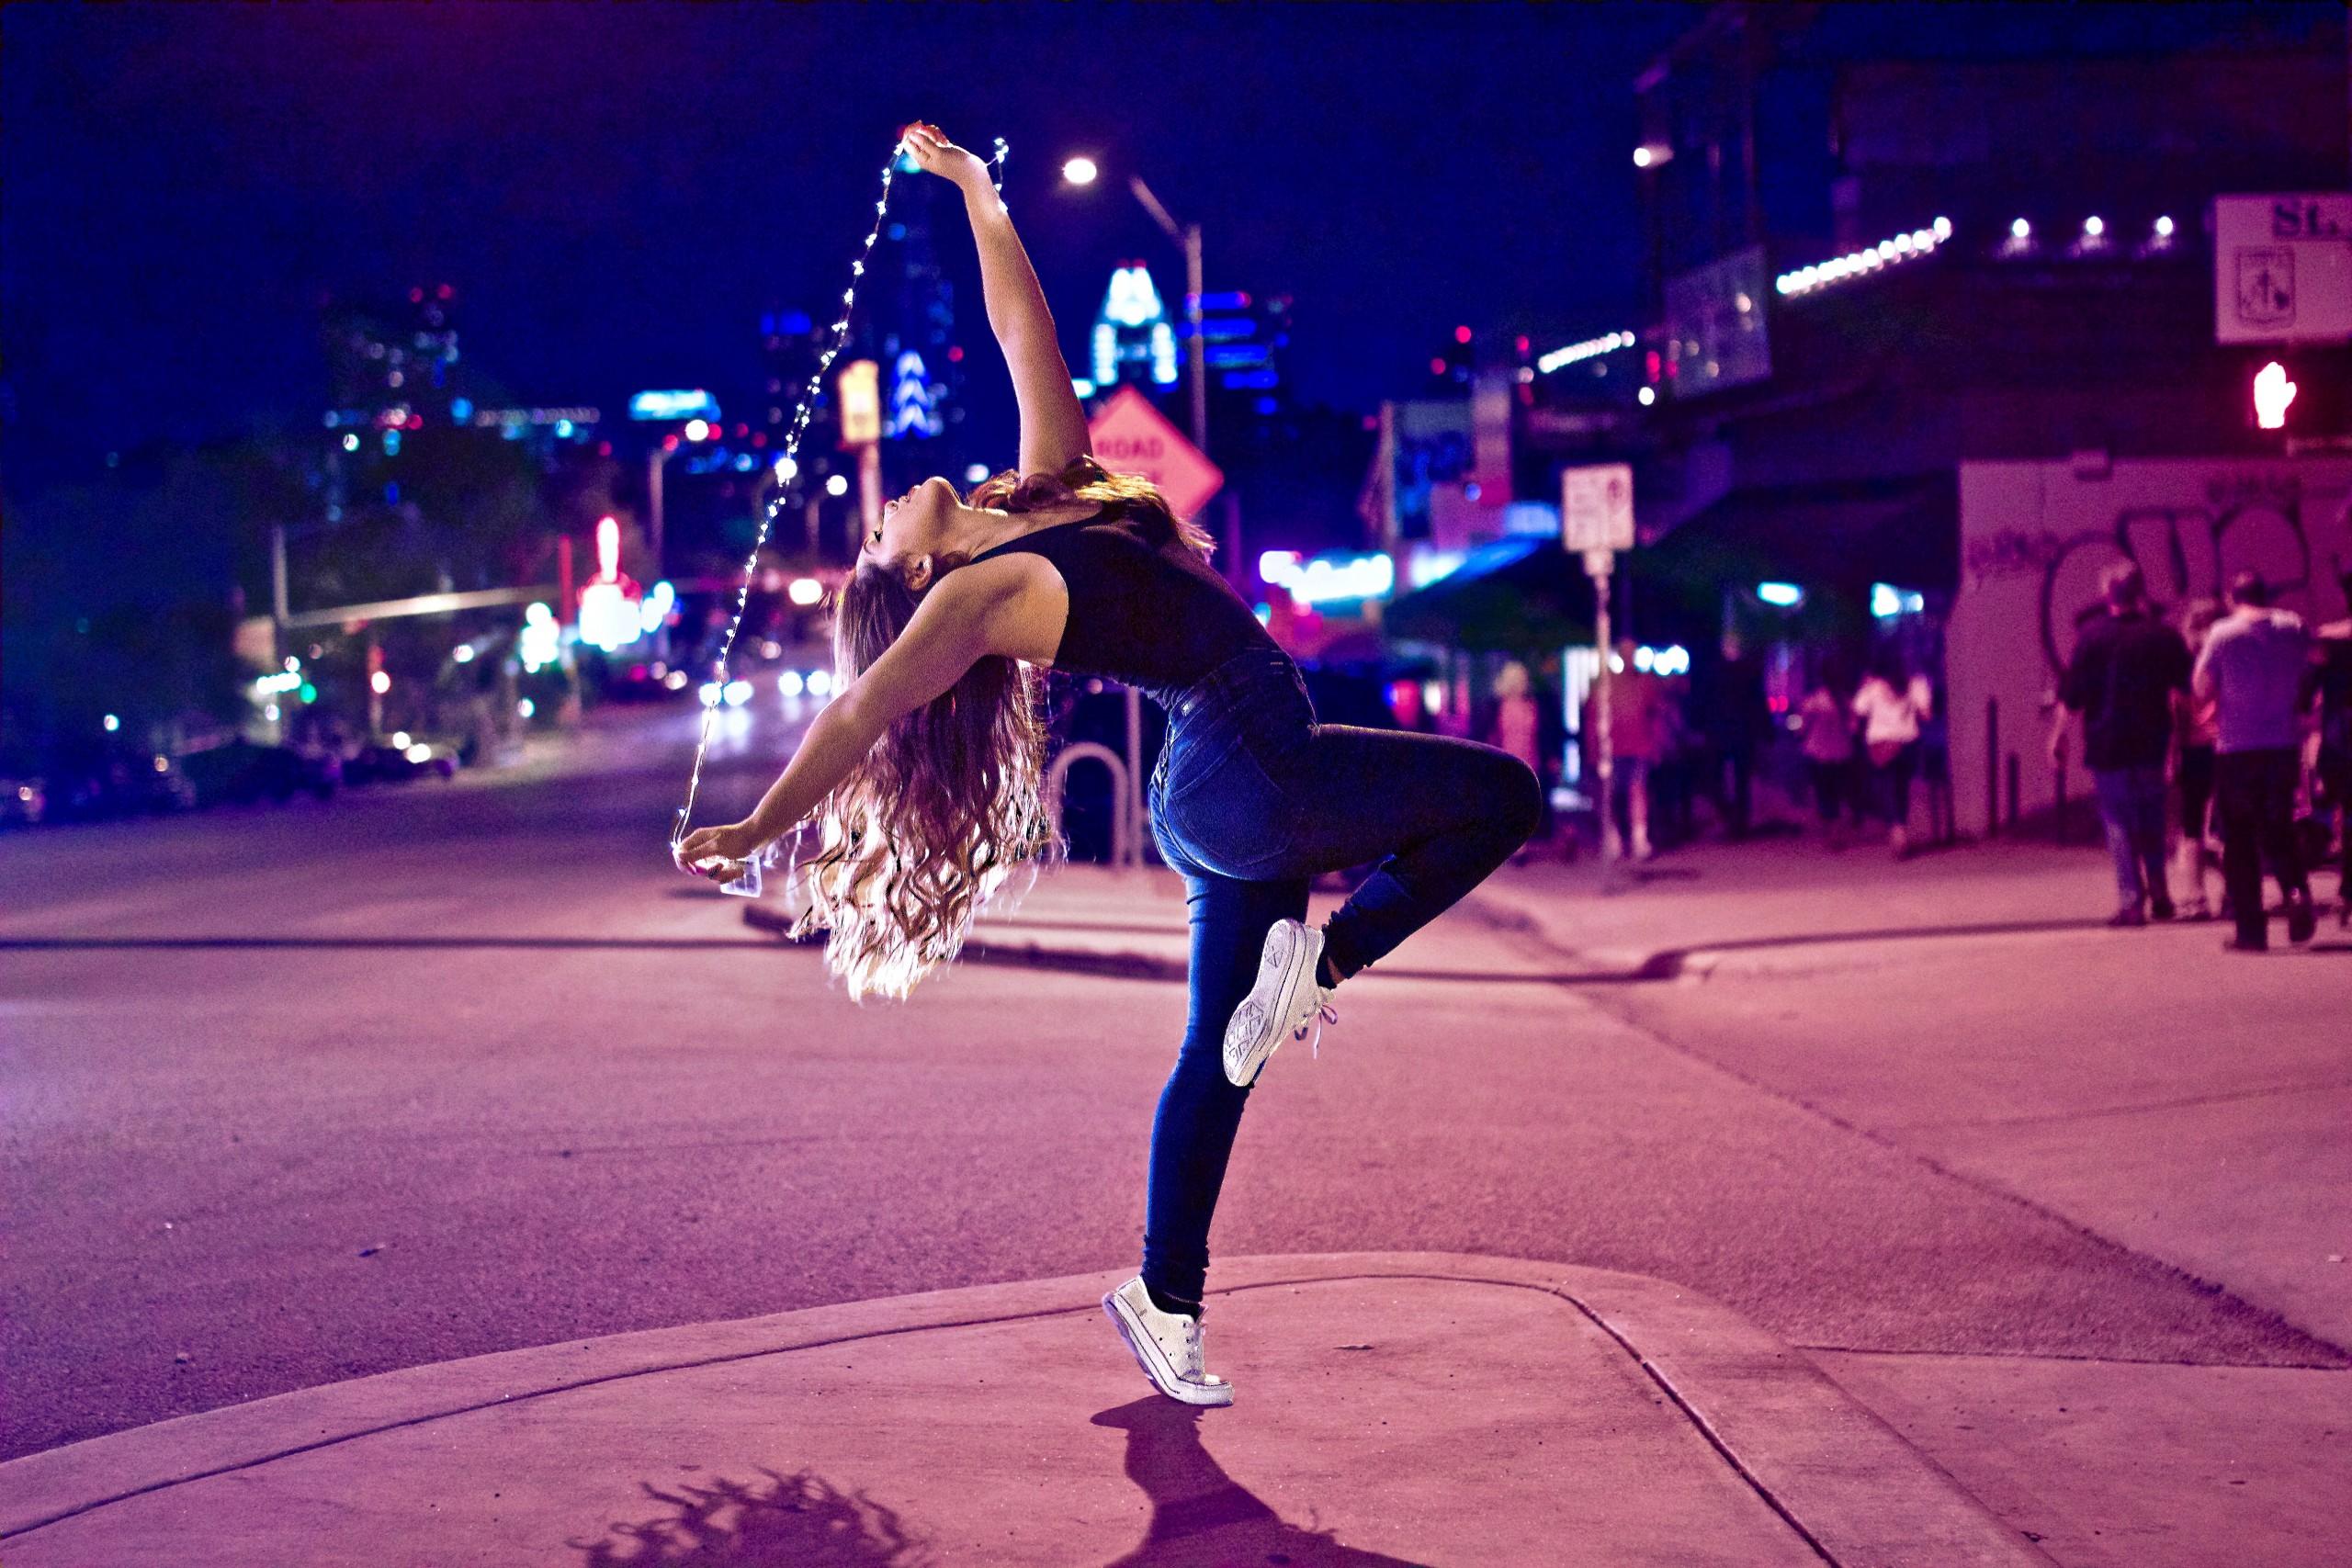 femeie dansând